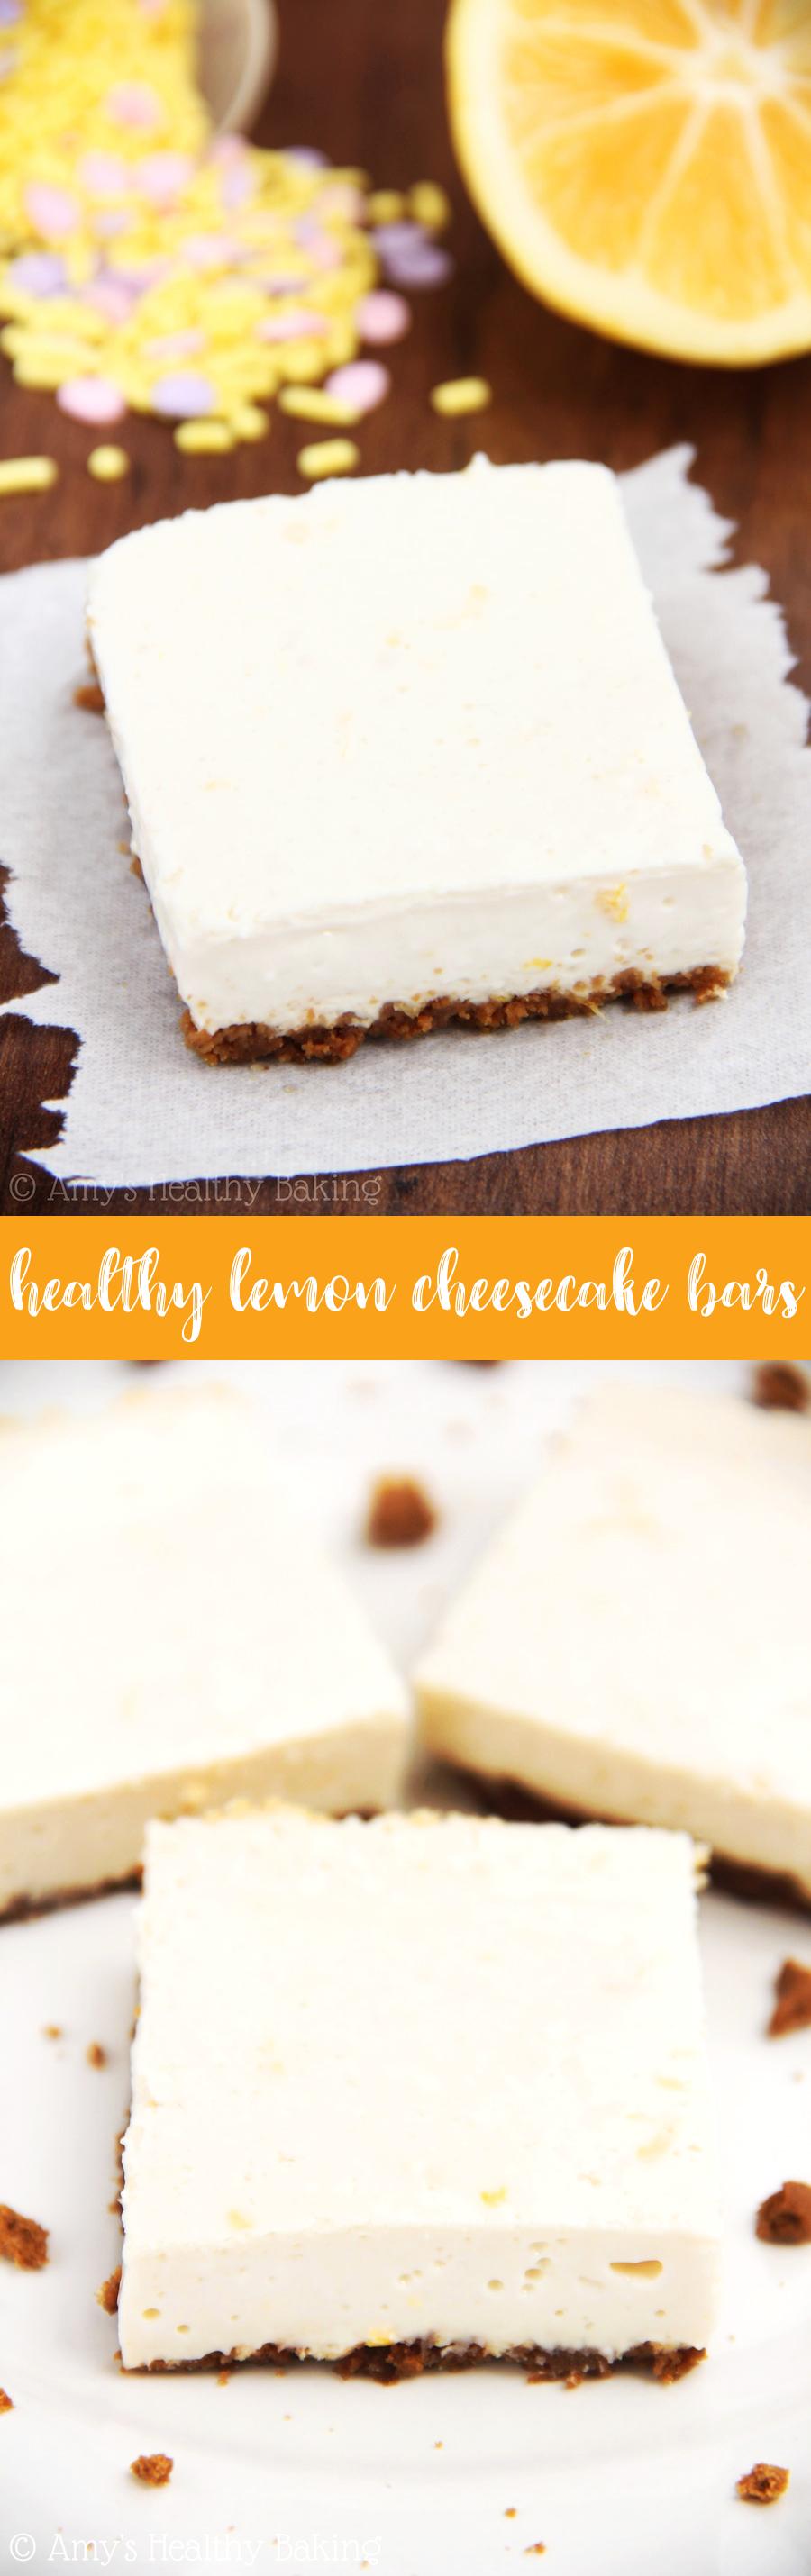 healthy lemon cheesecake bars